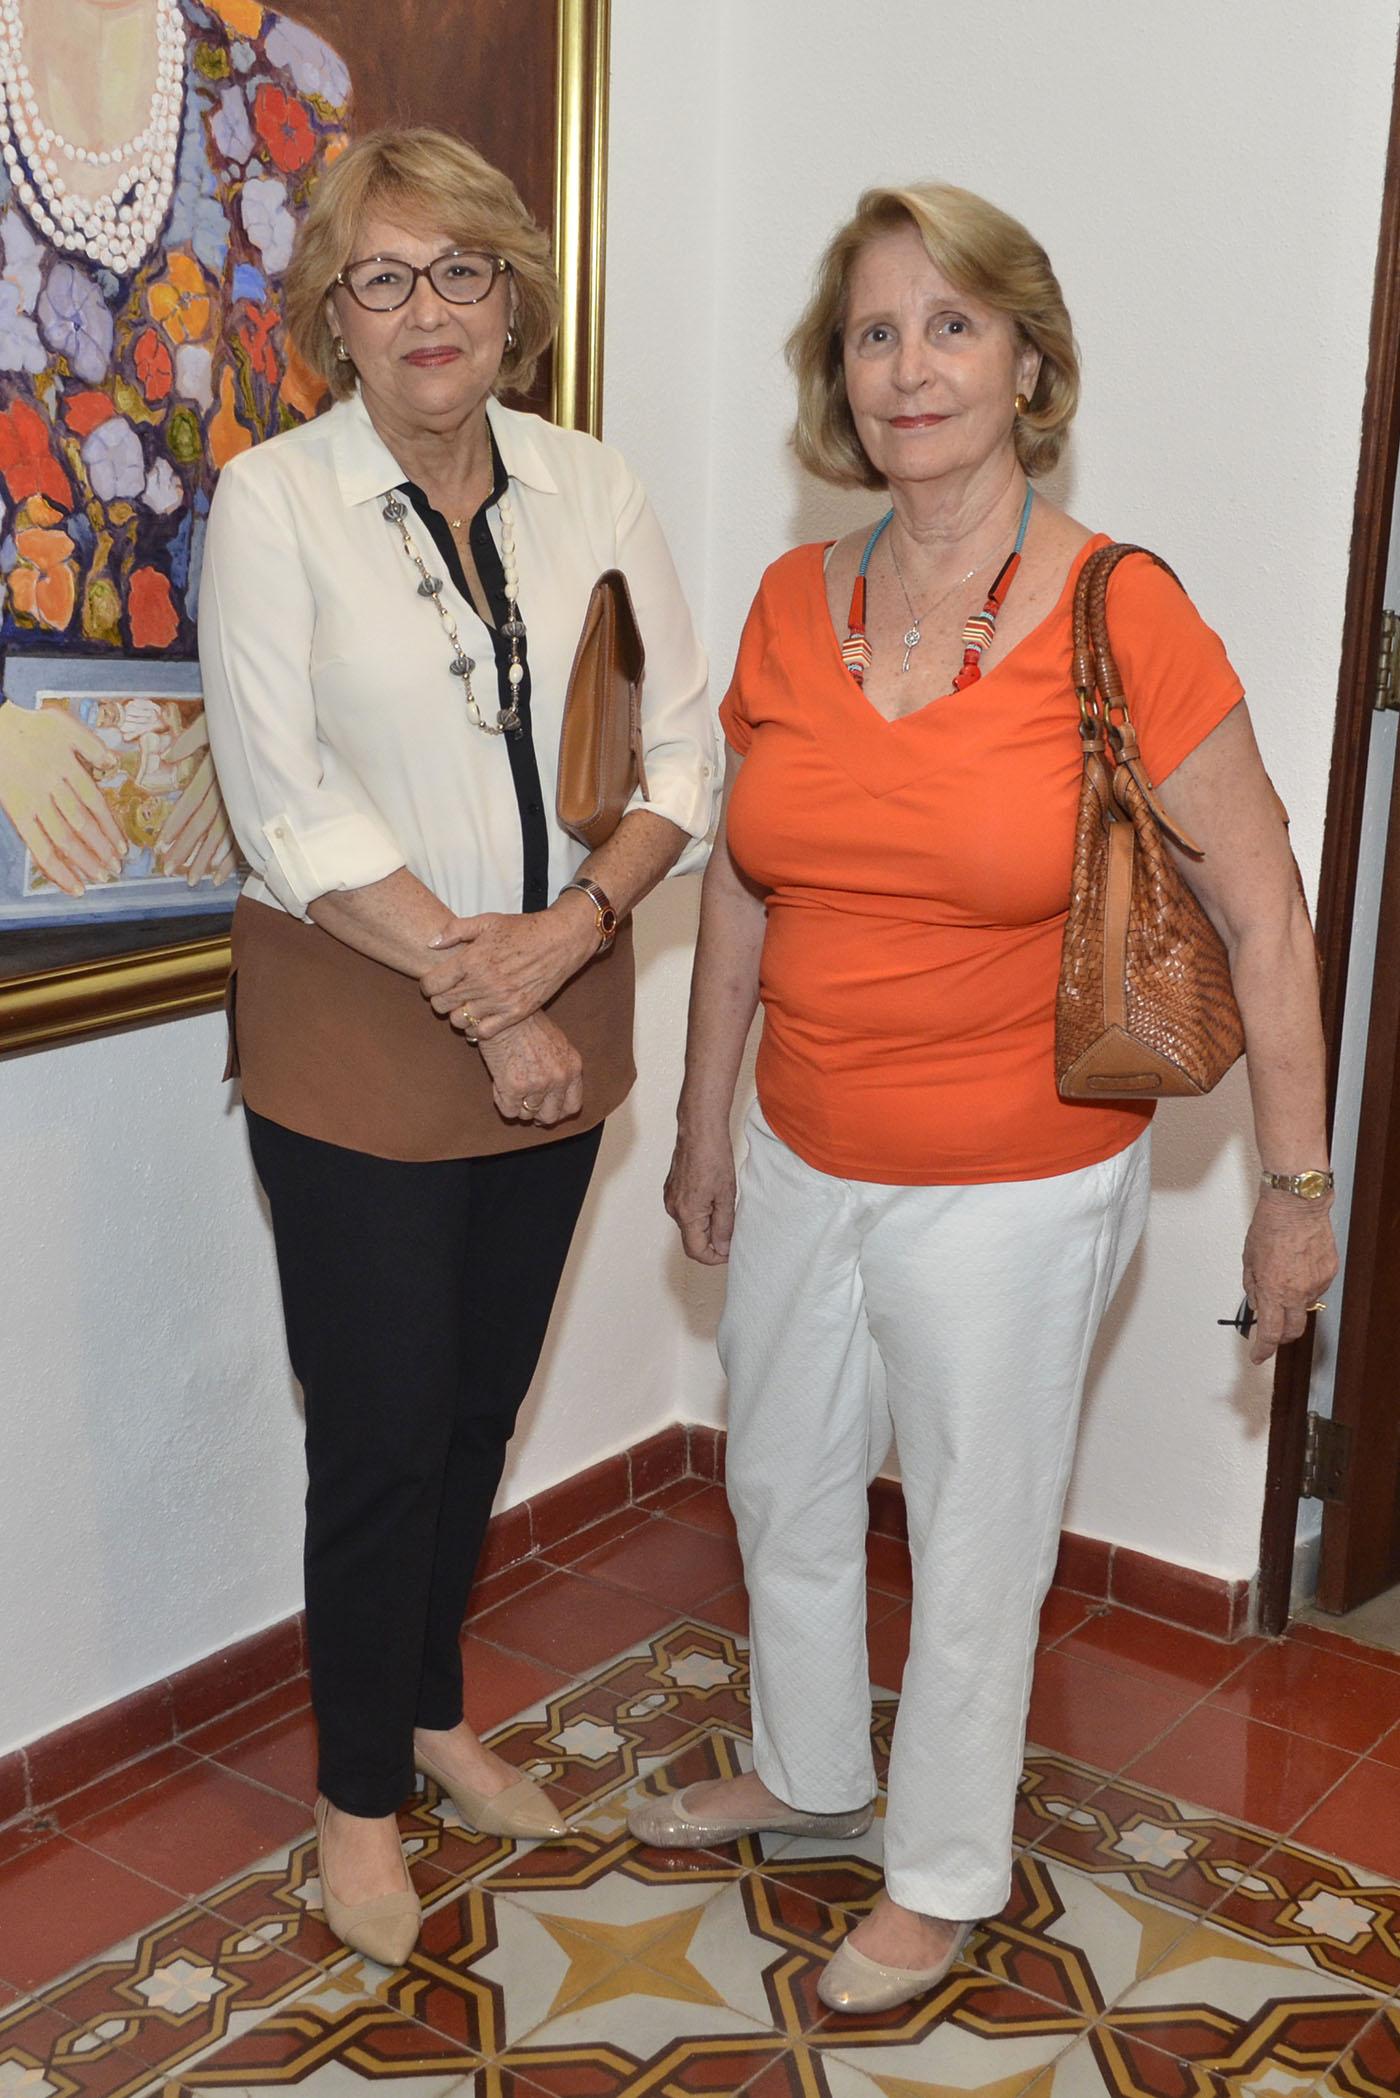 Foto 18 Ana Gloria Llerena y Victoria de González.jpg